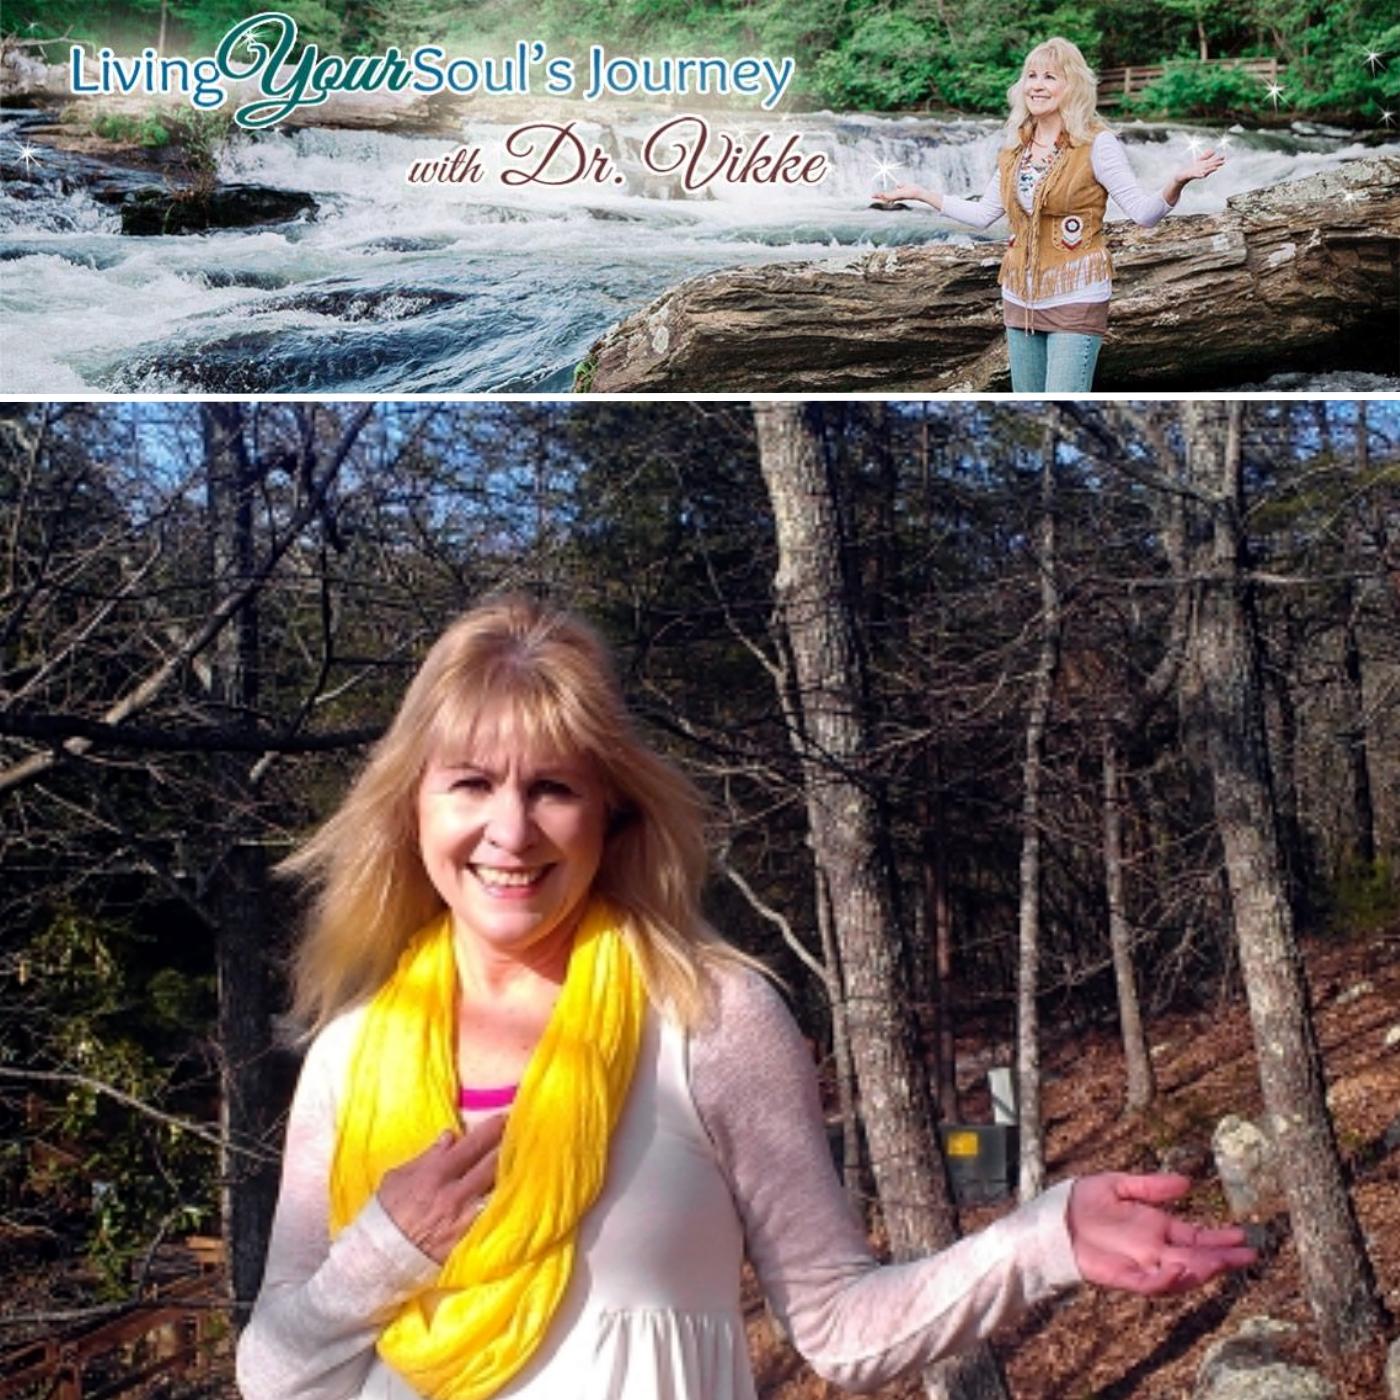 Living Your Souls Journey with Dr Vikke